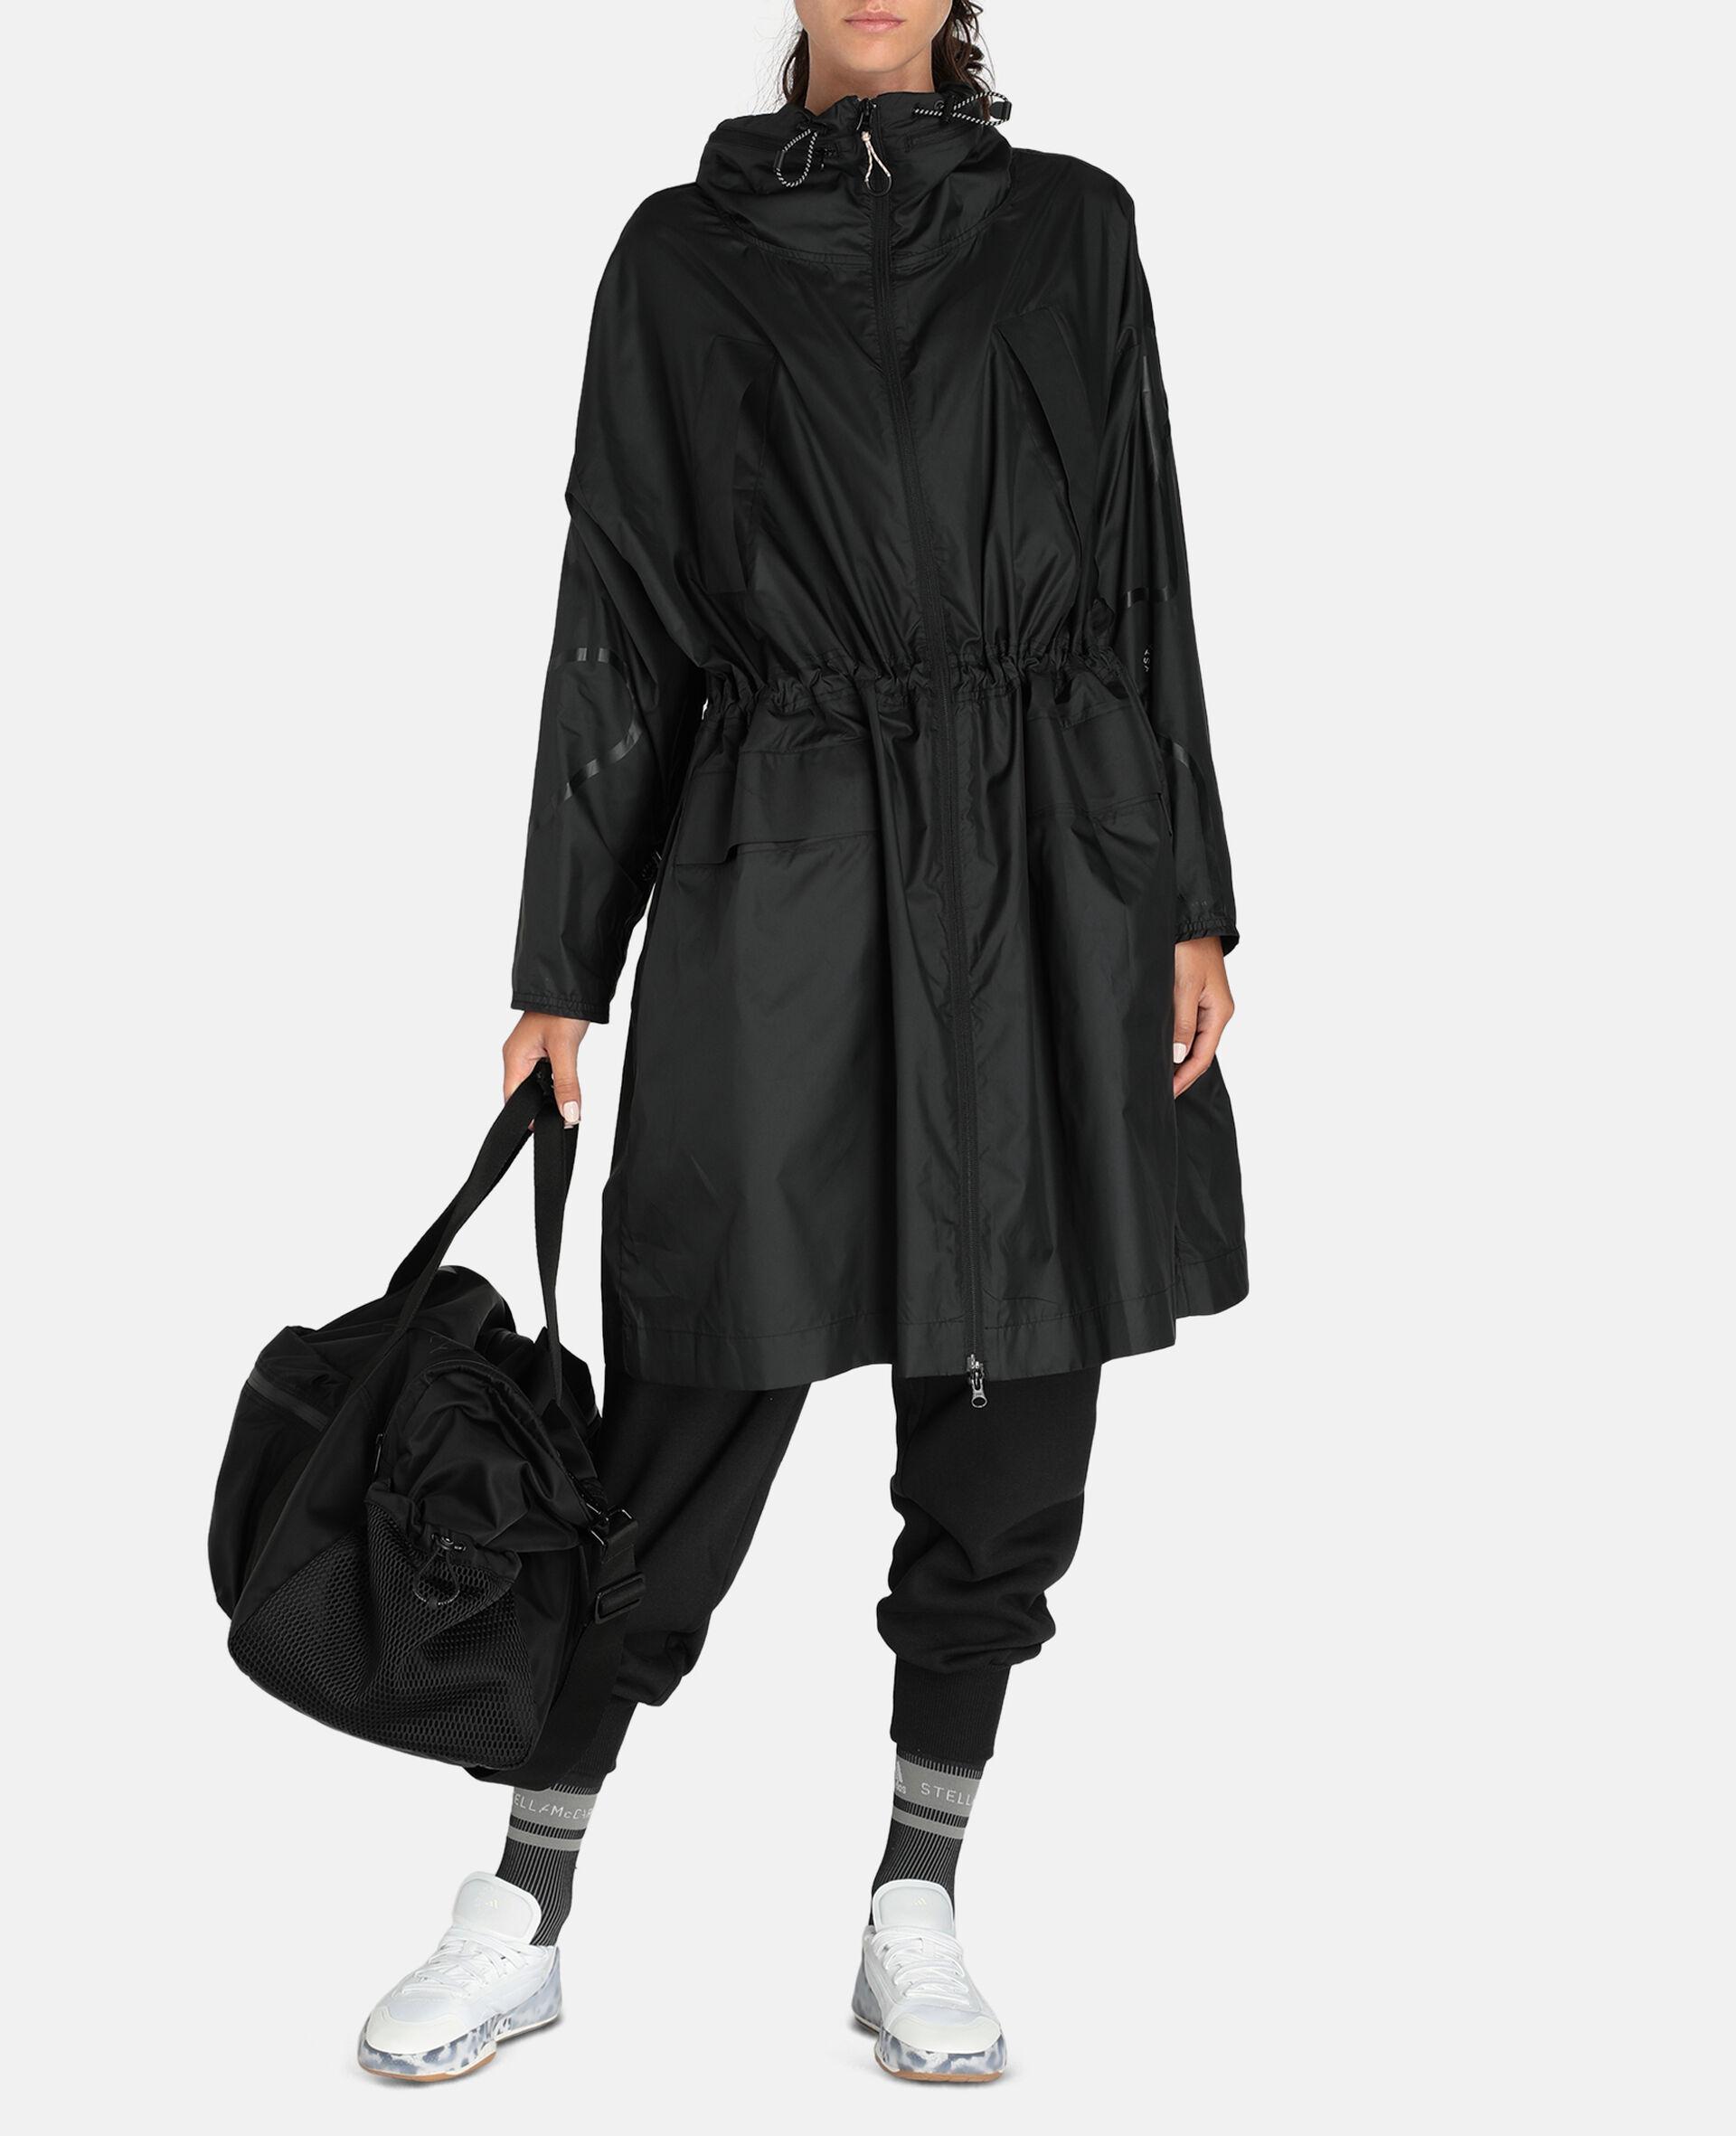 Grey Training Sweatpants-Black-large image number 1